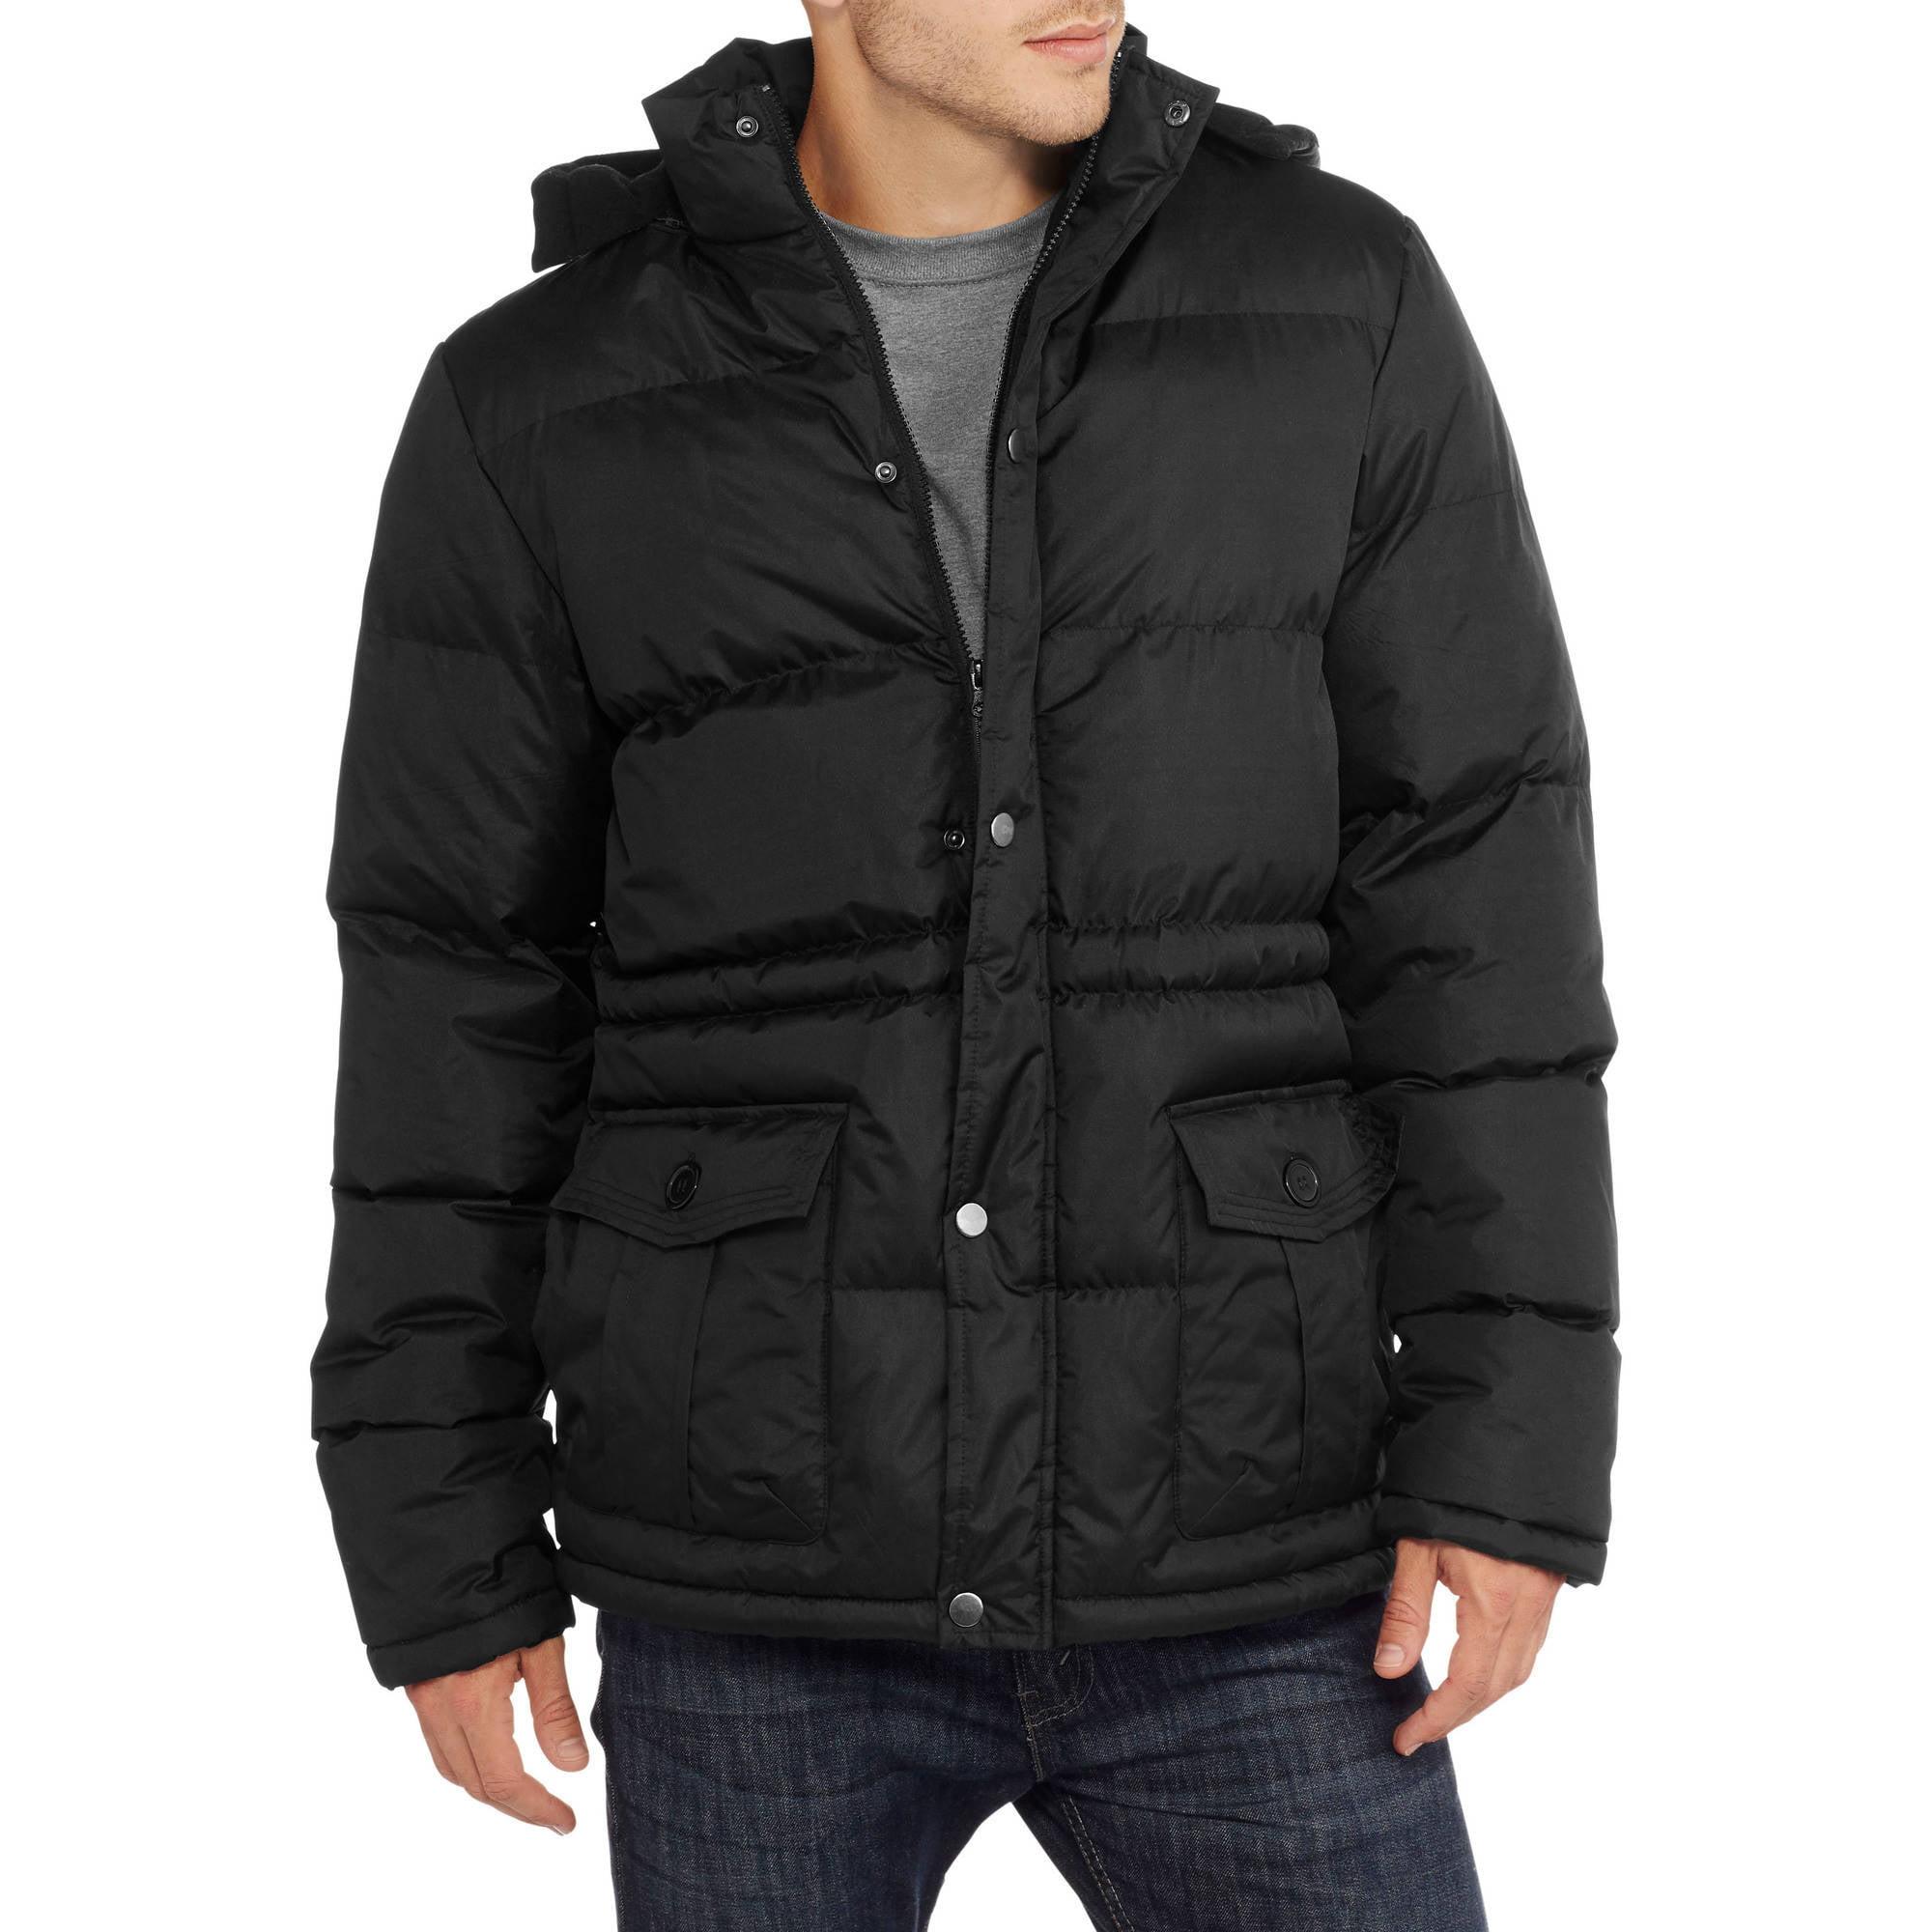 Climate Concepts Big Men's Polar Fleece Lined Bubble Jacket with Hood